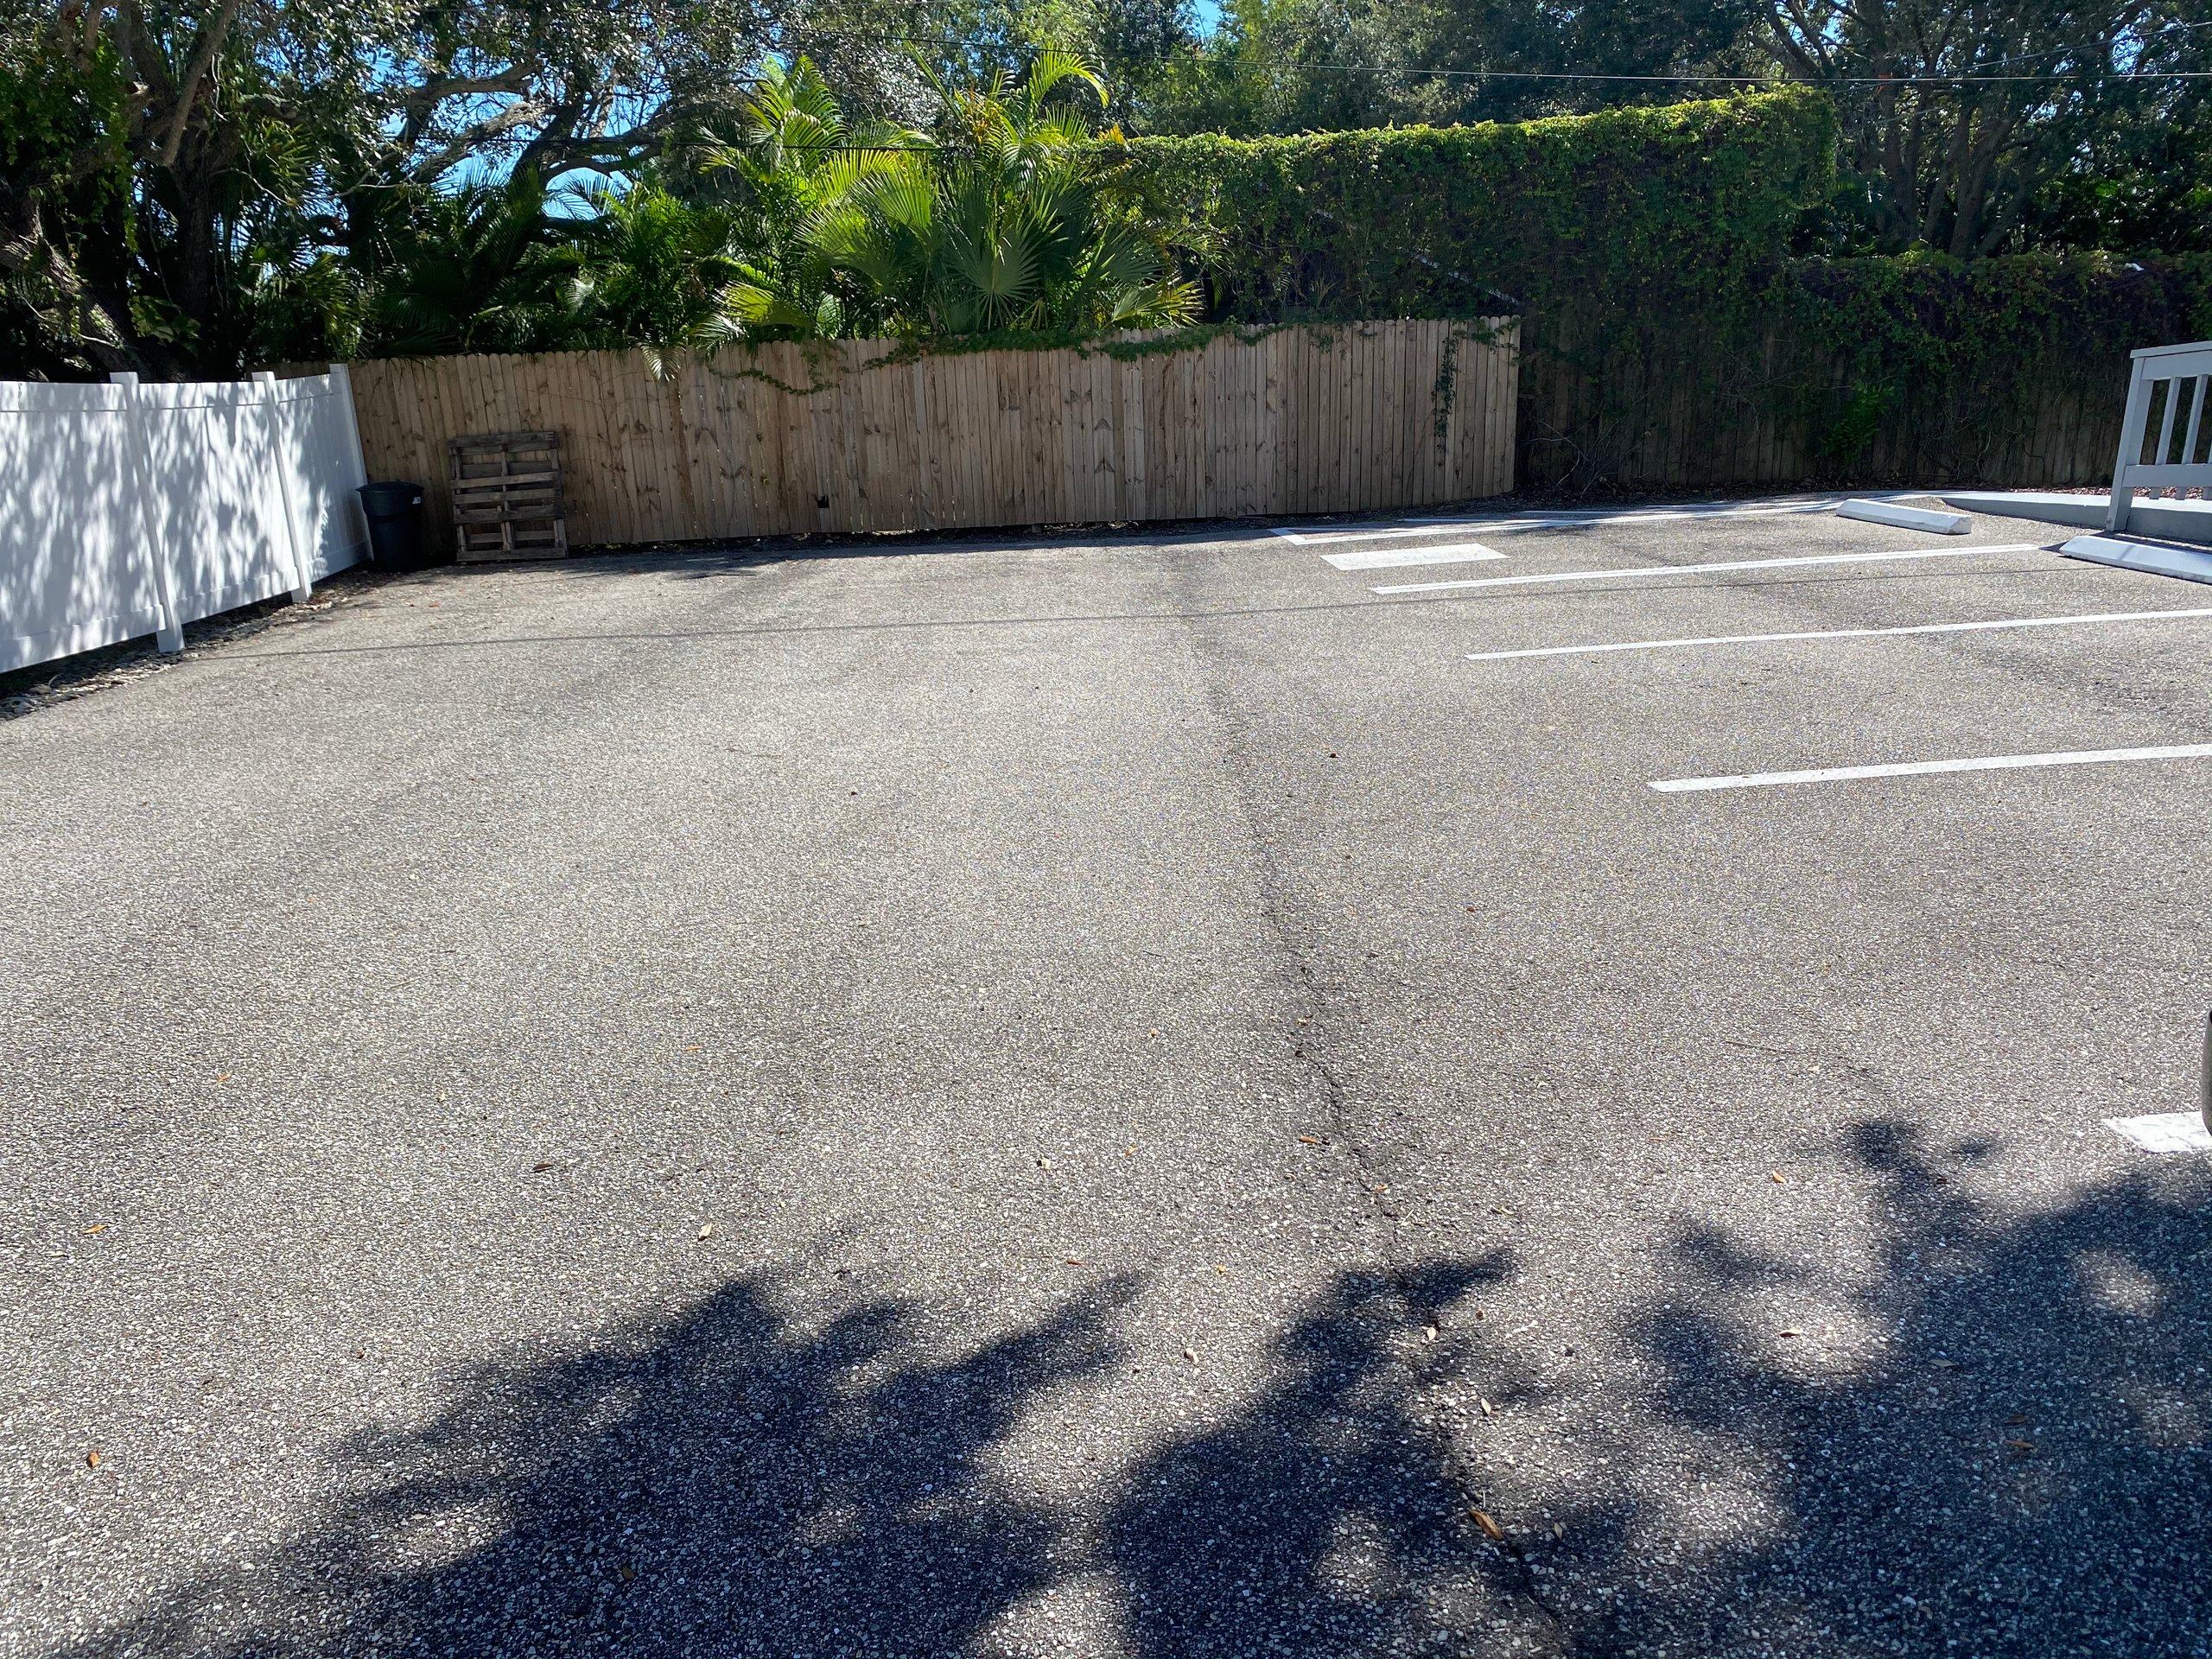 18x10 Parking Lot self storage unit